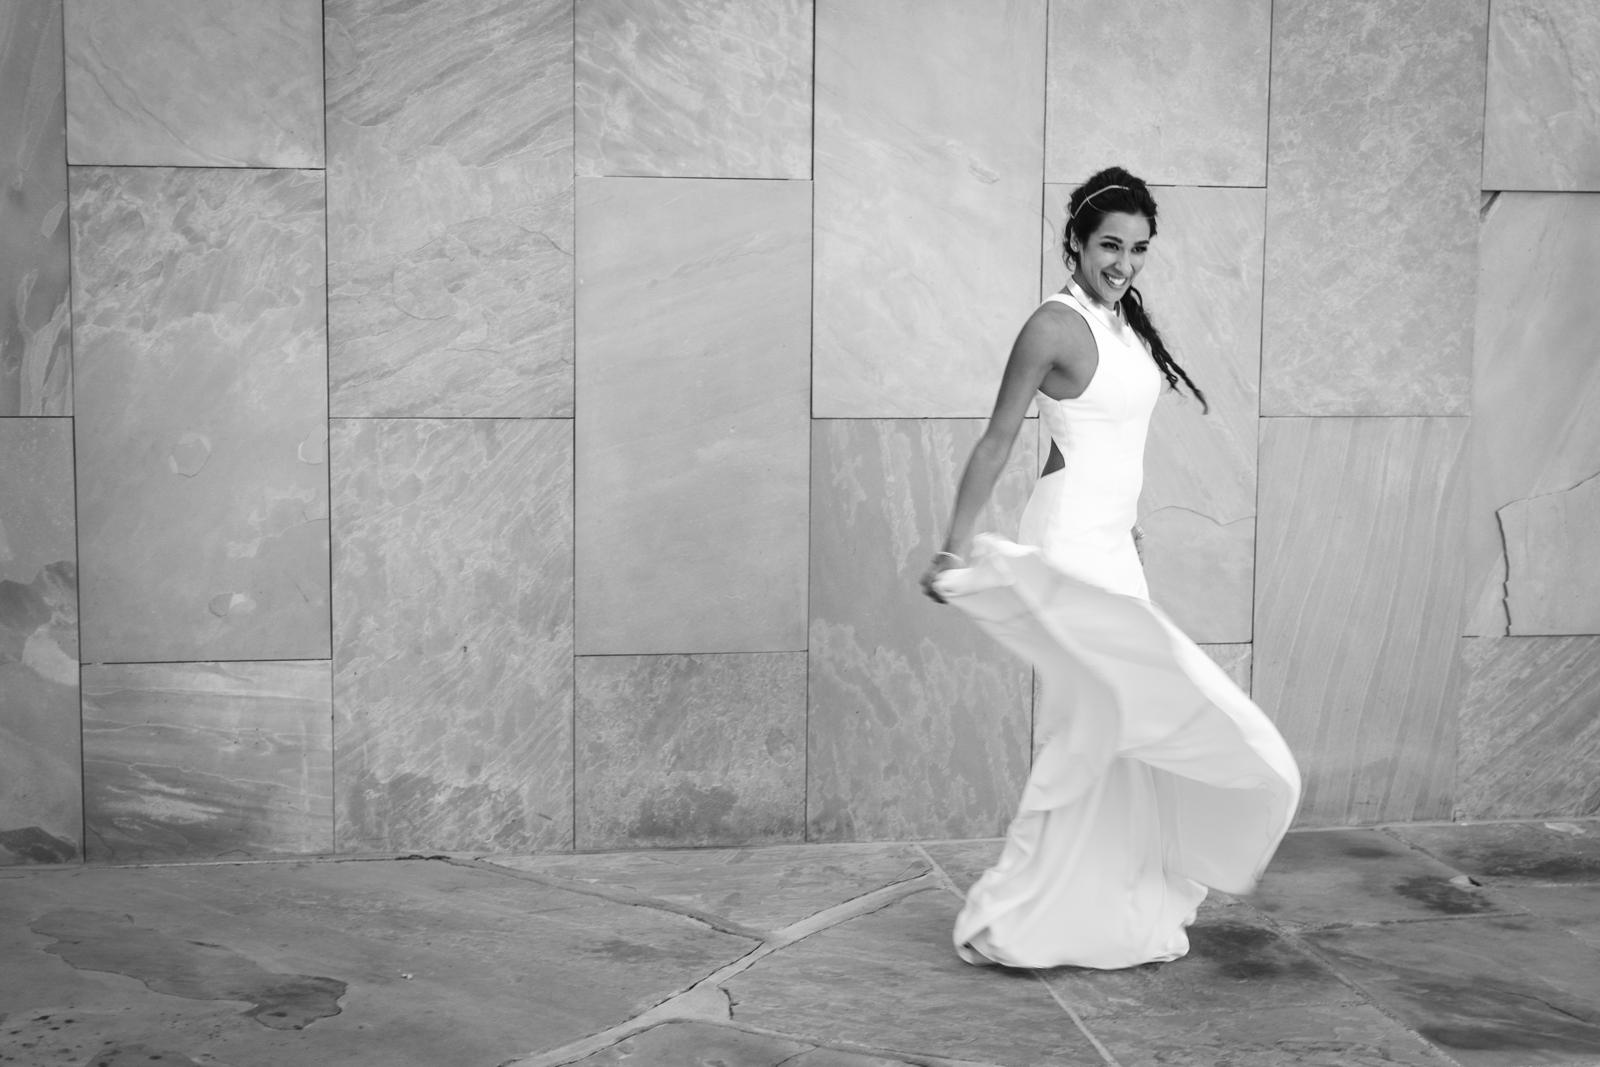 2015.10.17 Reid and Melissa Wedding (294 of 522)